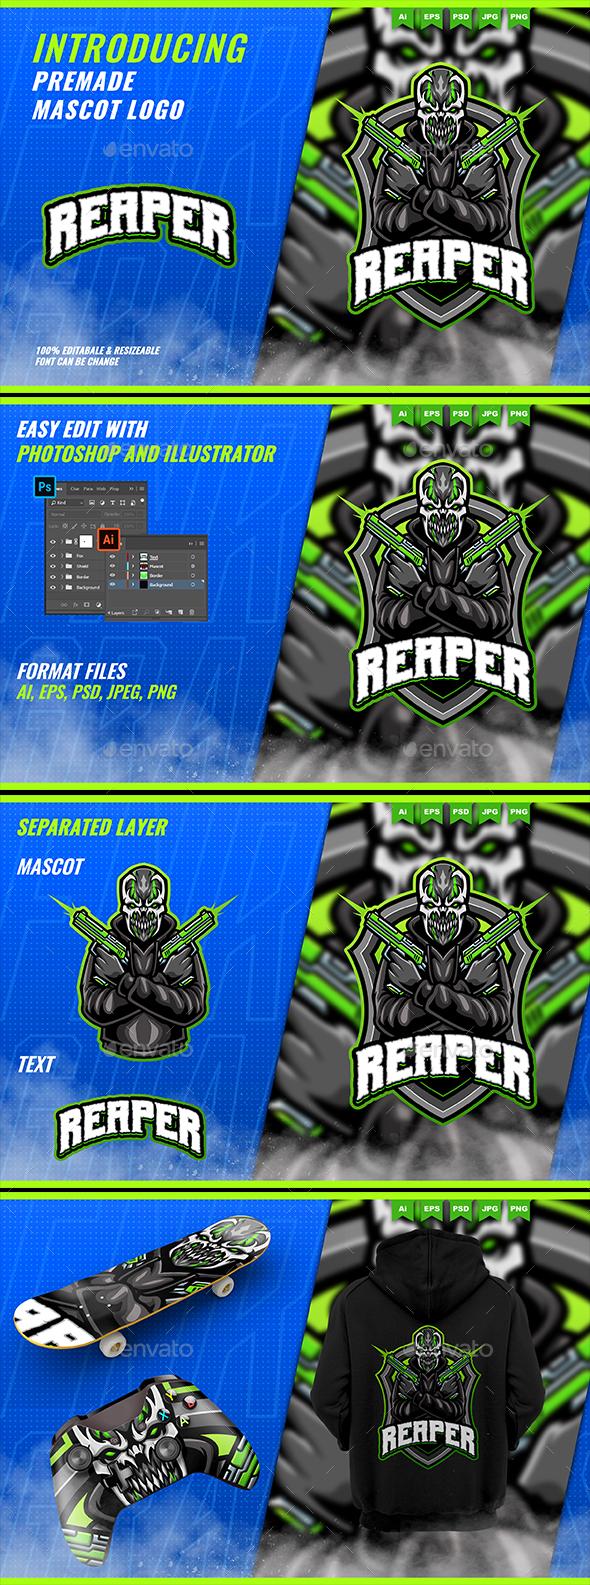 Creepy Shooter Monster - Mascot Esport Logo Template